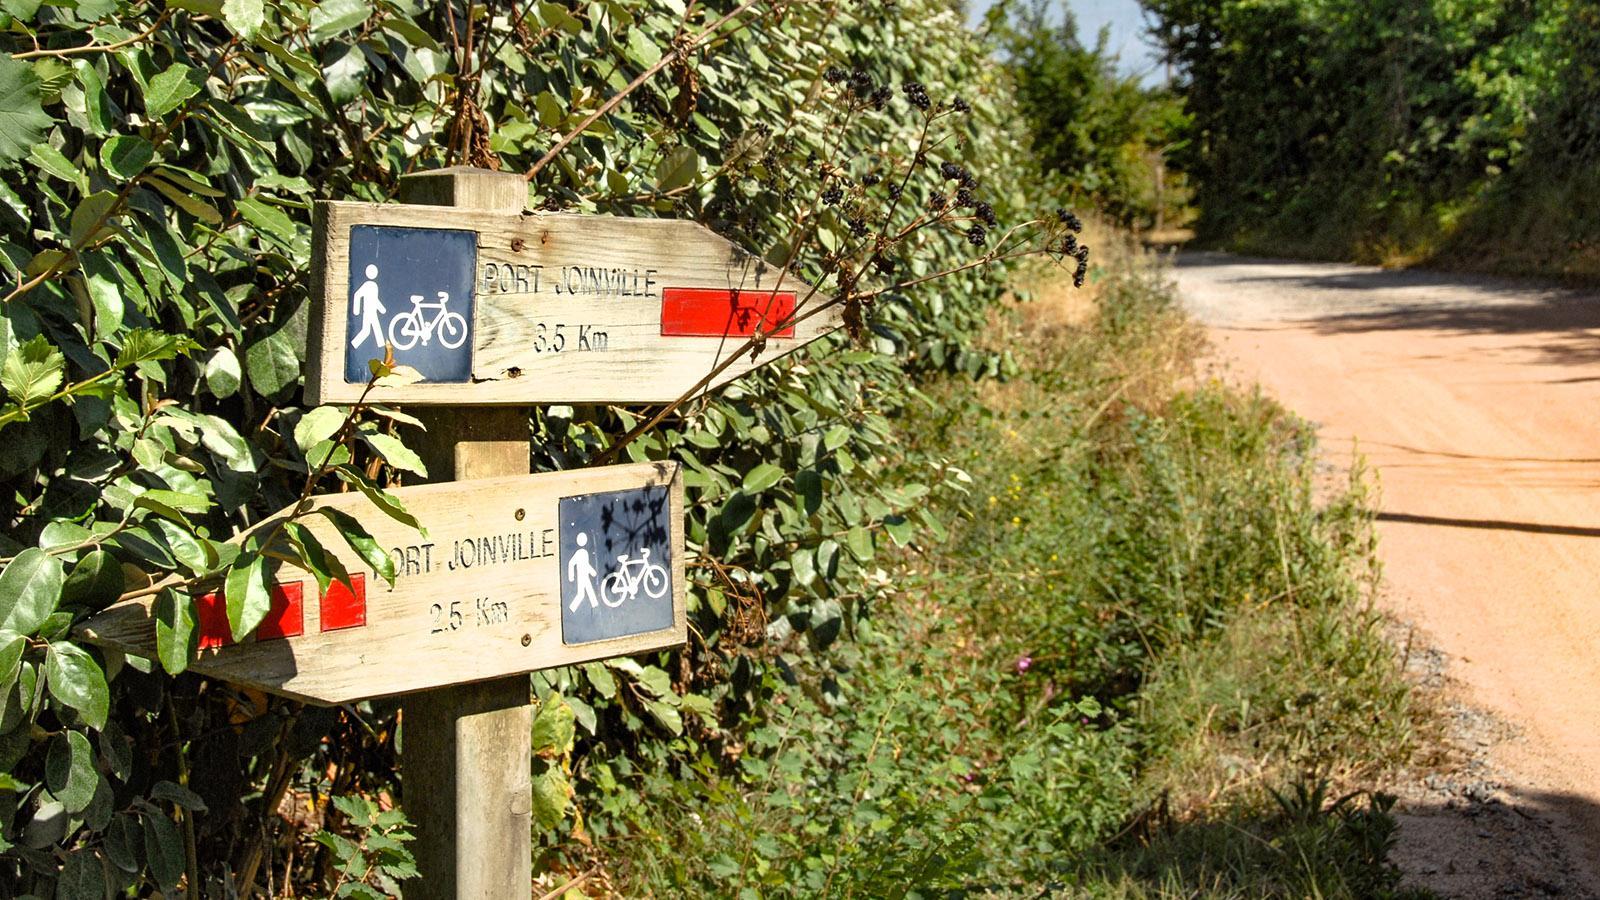 Île d'Yeu: bei Ker Gigou: Rad- und Wanderwegweiser